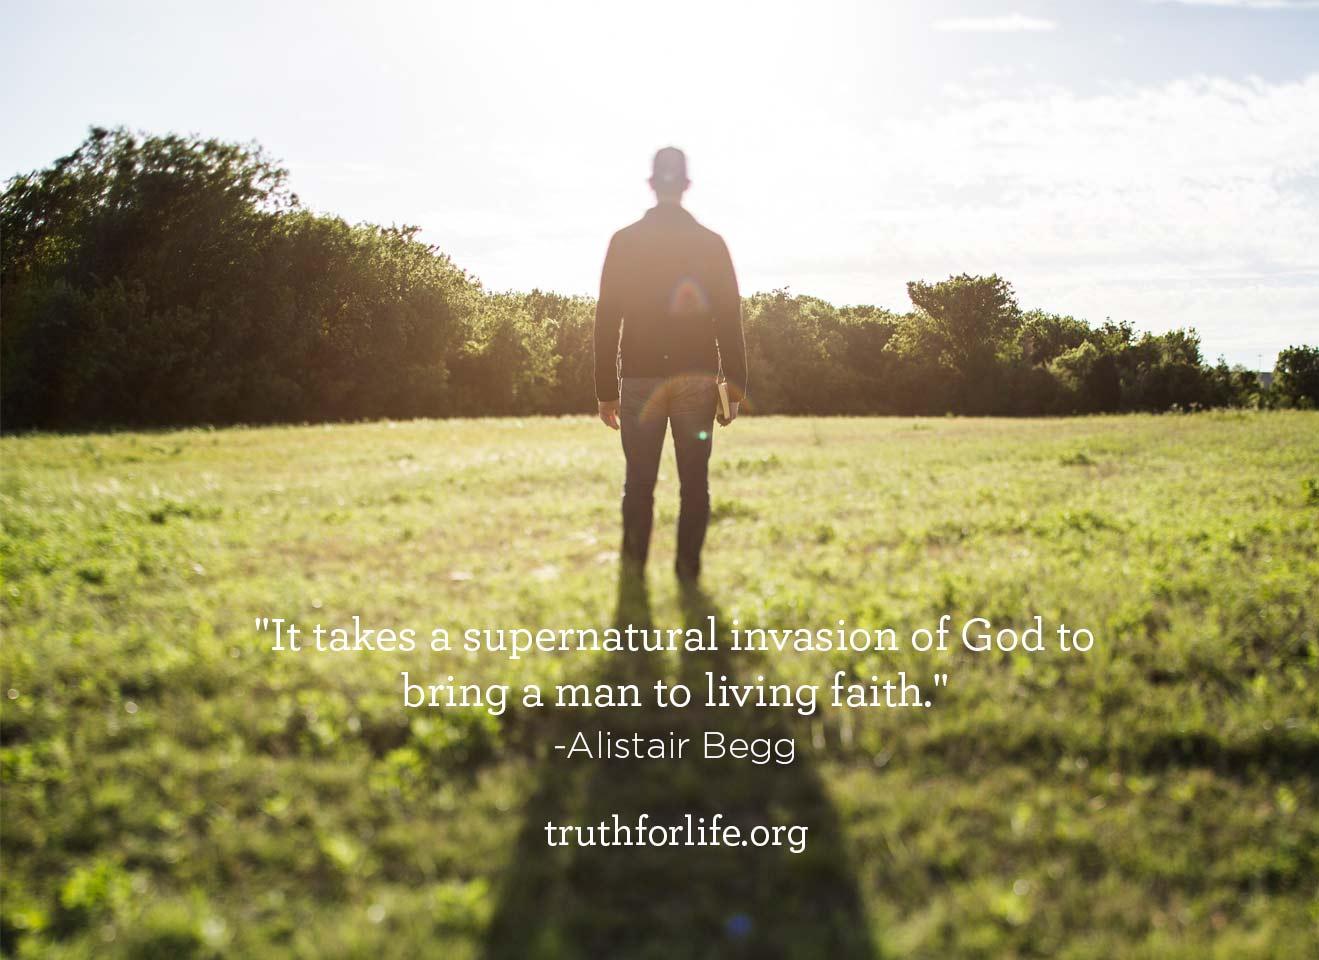 thumbnail image for A Supernatural Invasion of God